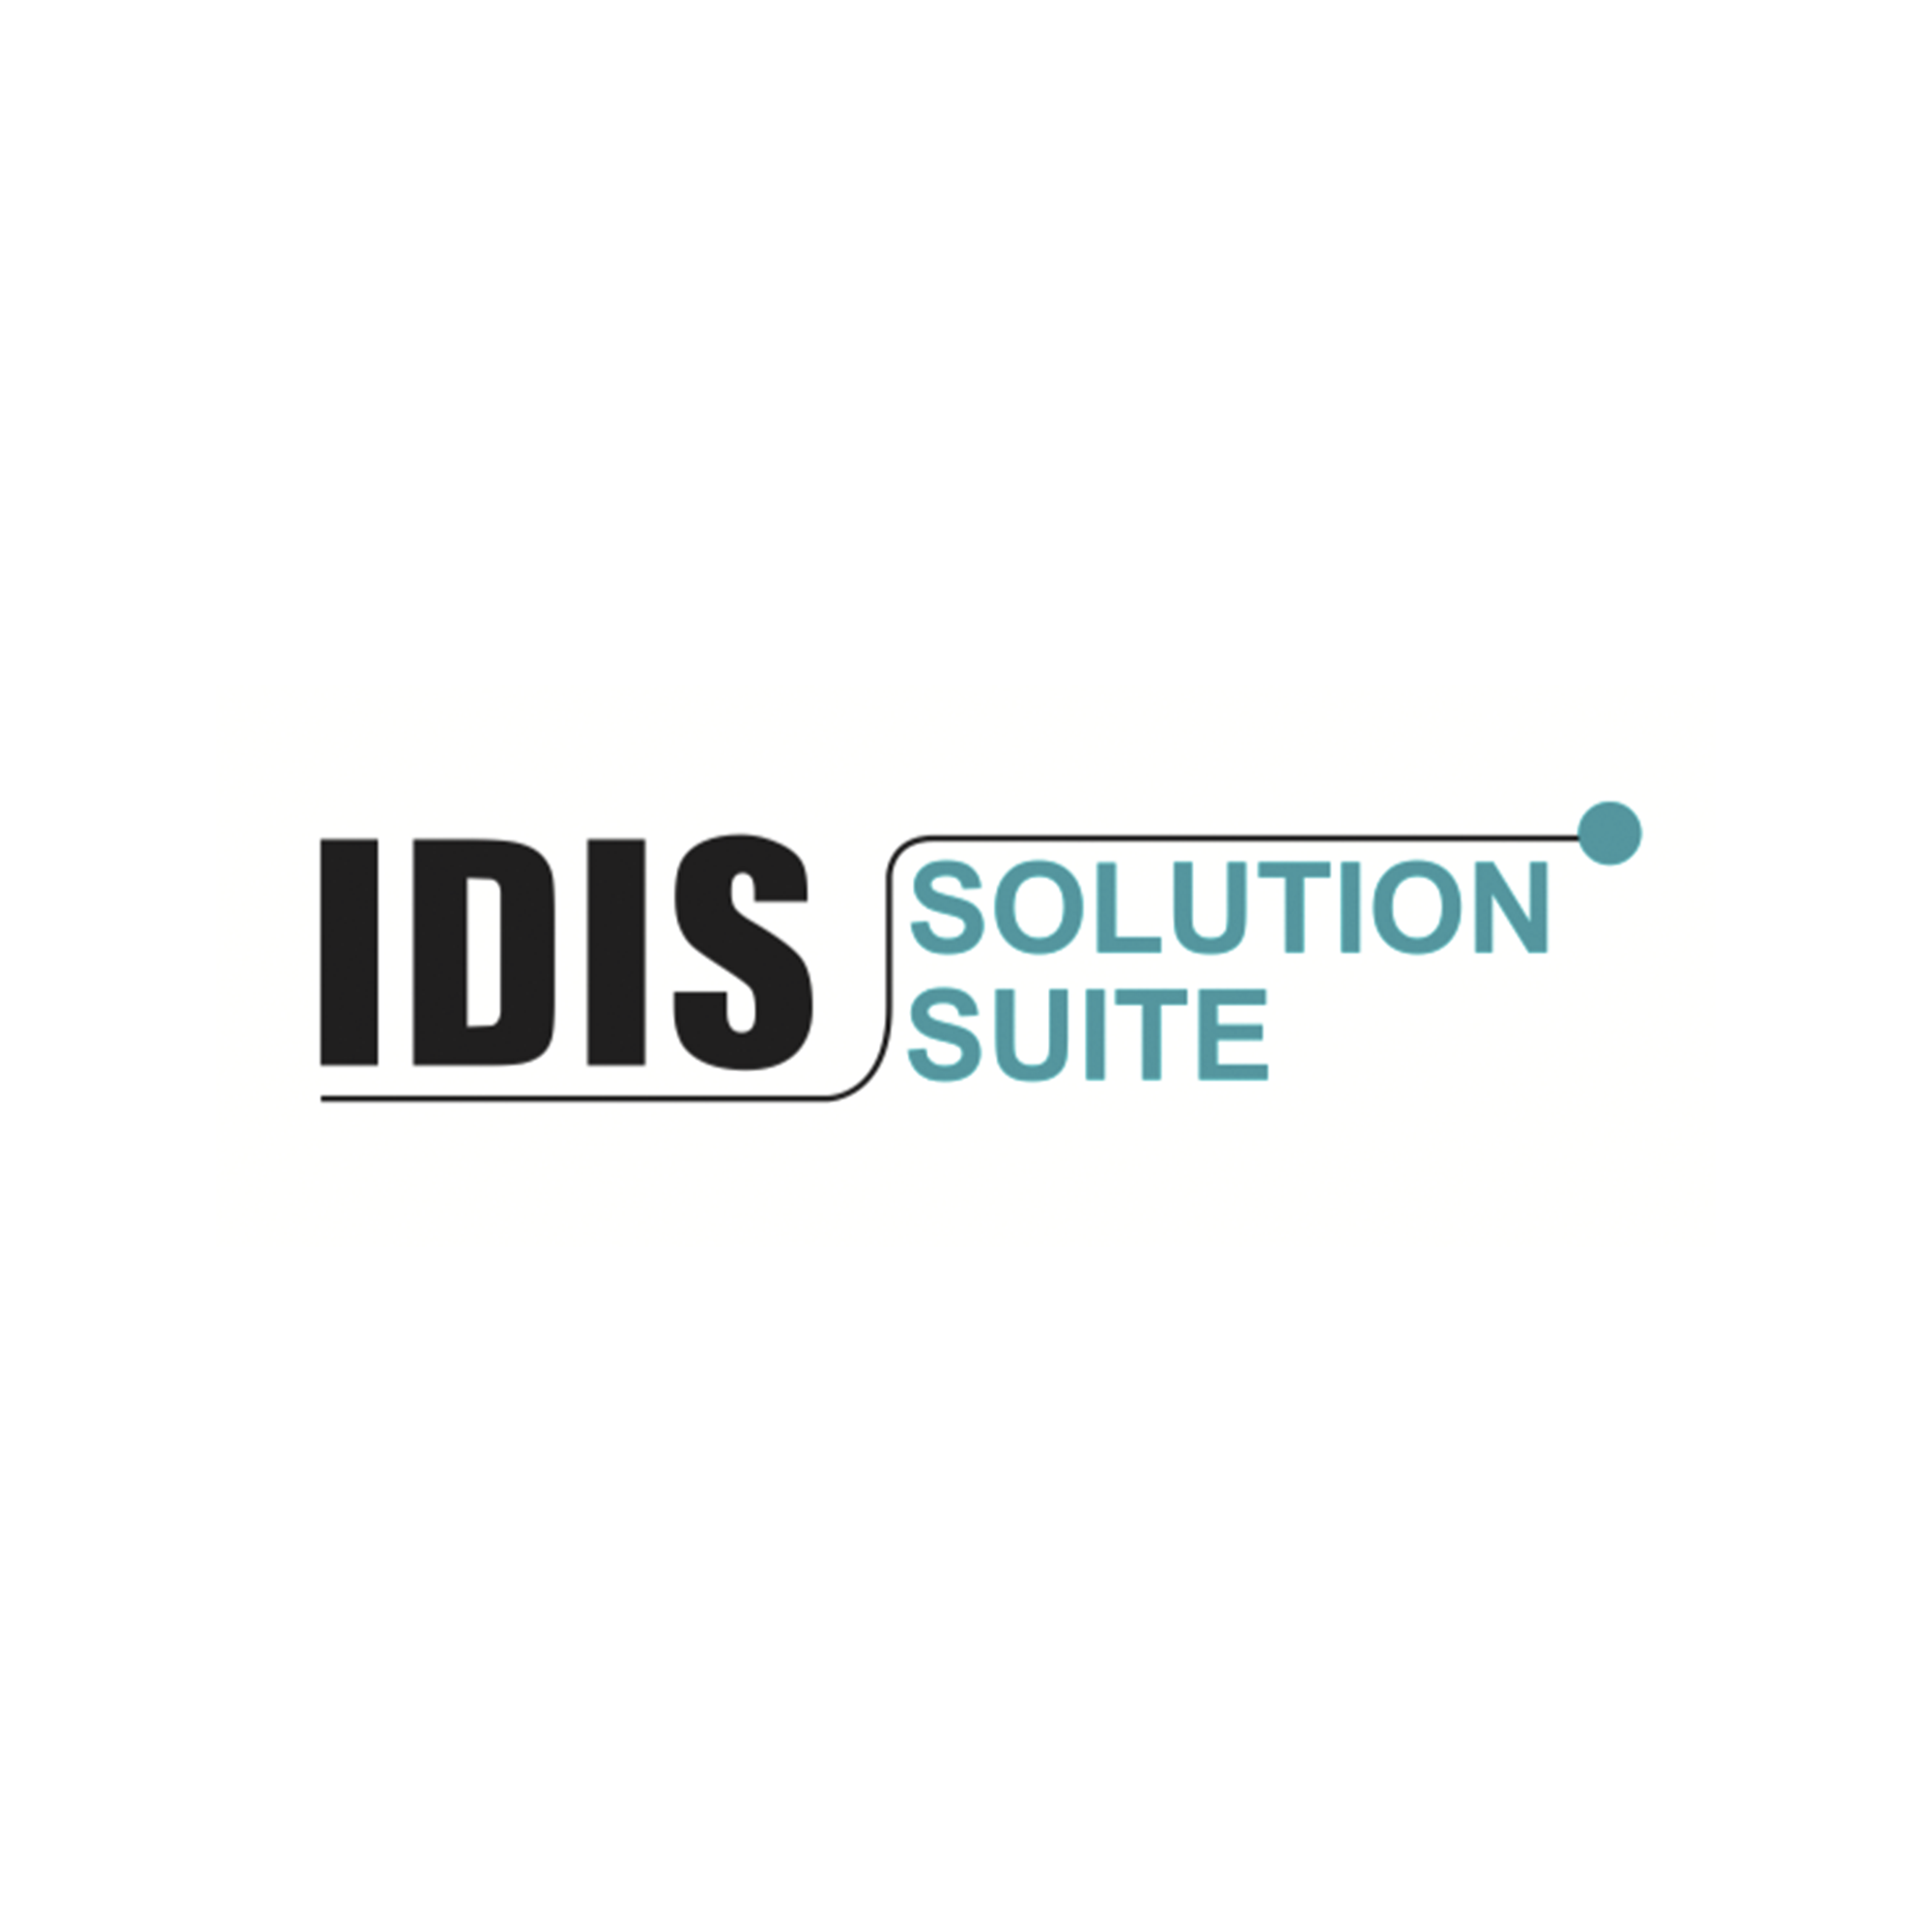 Licencia VMS IDIS Solution Suite Expert p/ 1 dispositivo  | Administración-Monitoreo-Transmisión-Grabación-Actualización- Analitica Basica | Hasta 64 usuarios simultáneos